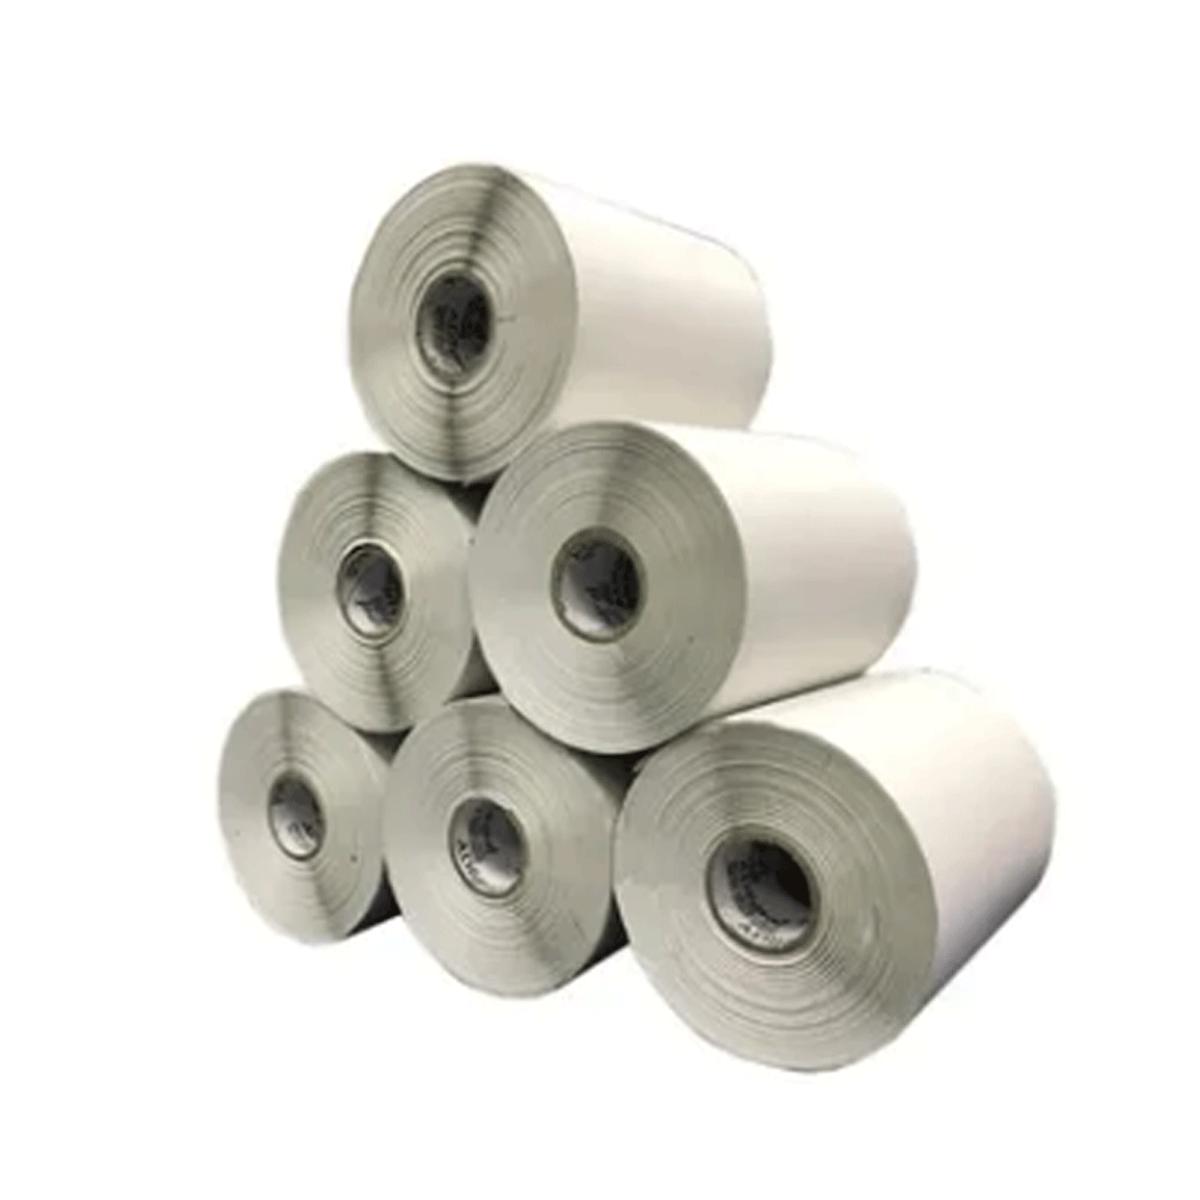 6 Rolos de Etiquetas Premium 10x15 Neutra Branca Serrilha Mercado Envios